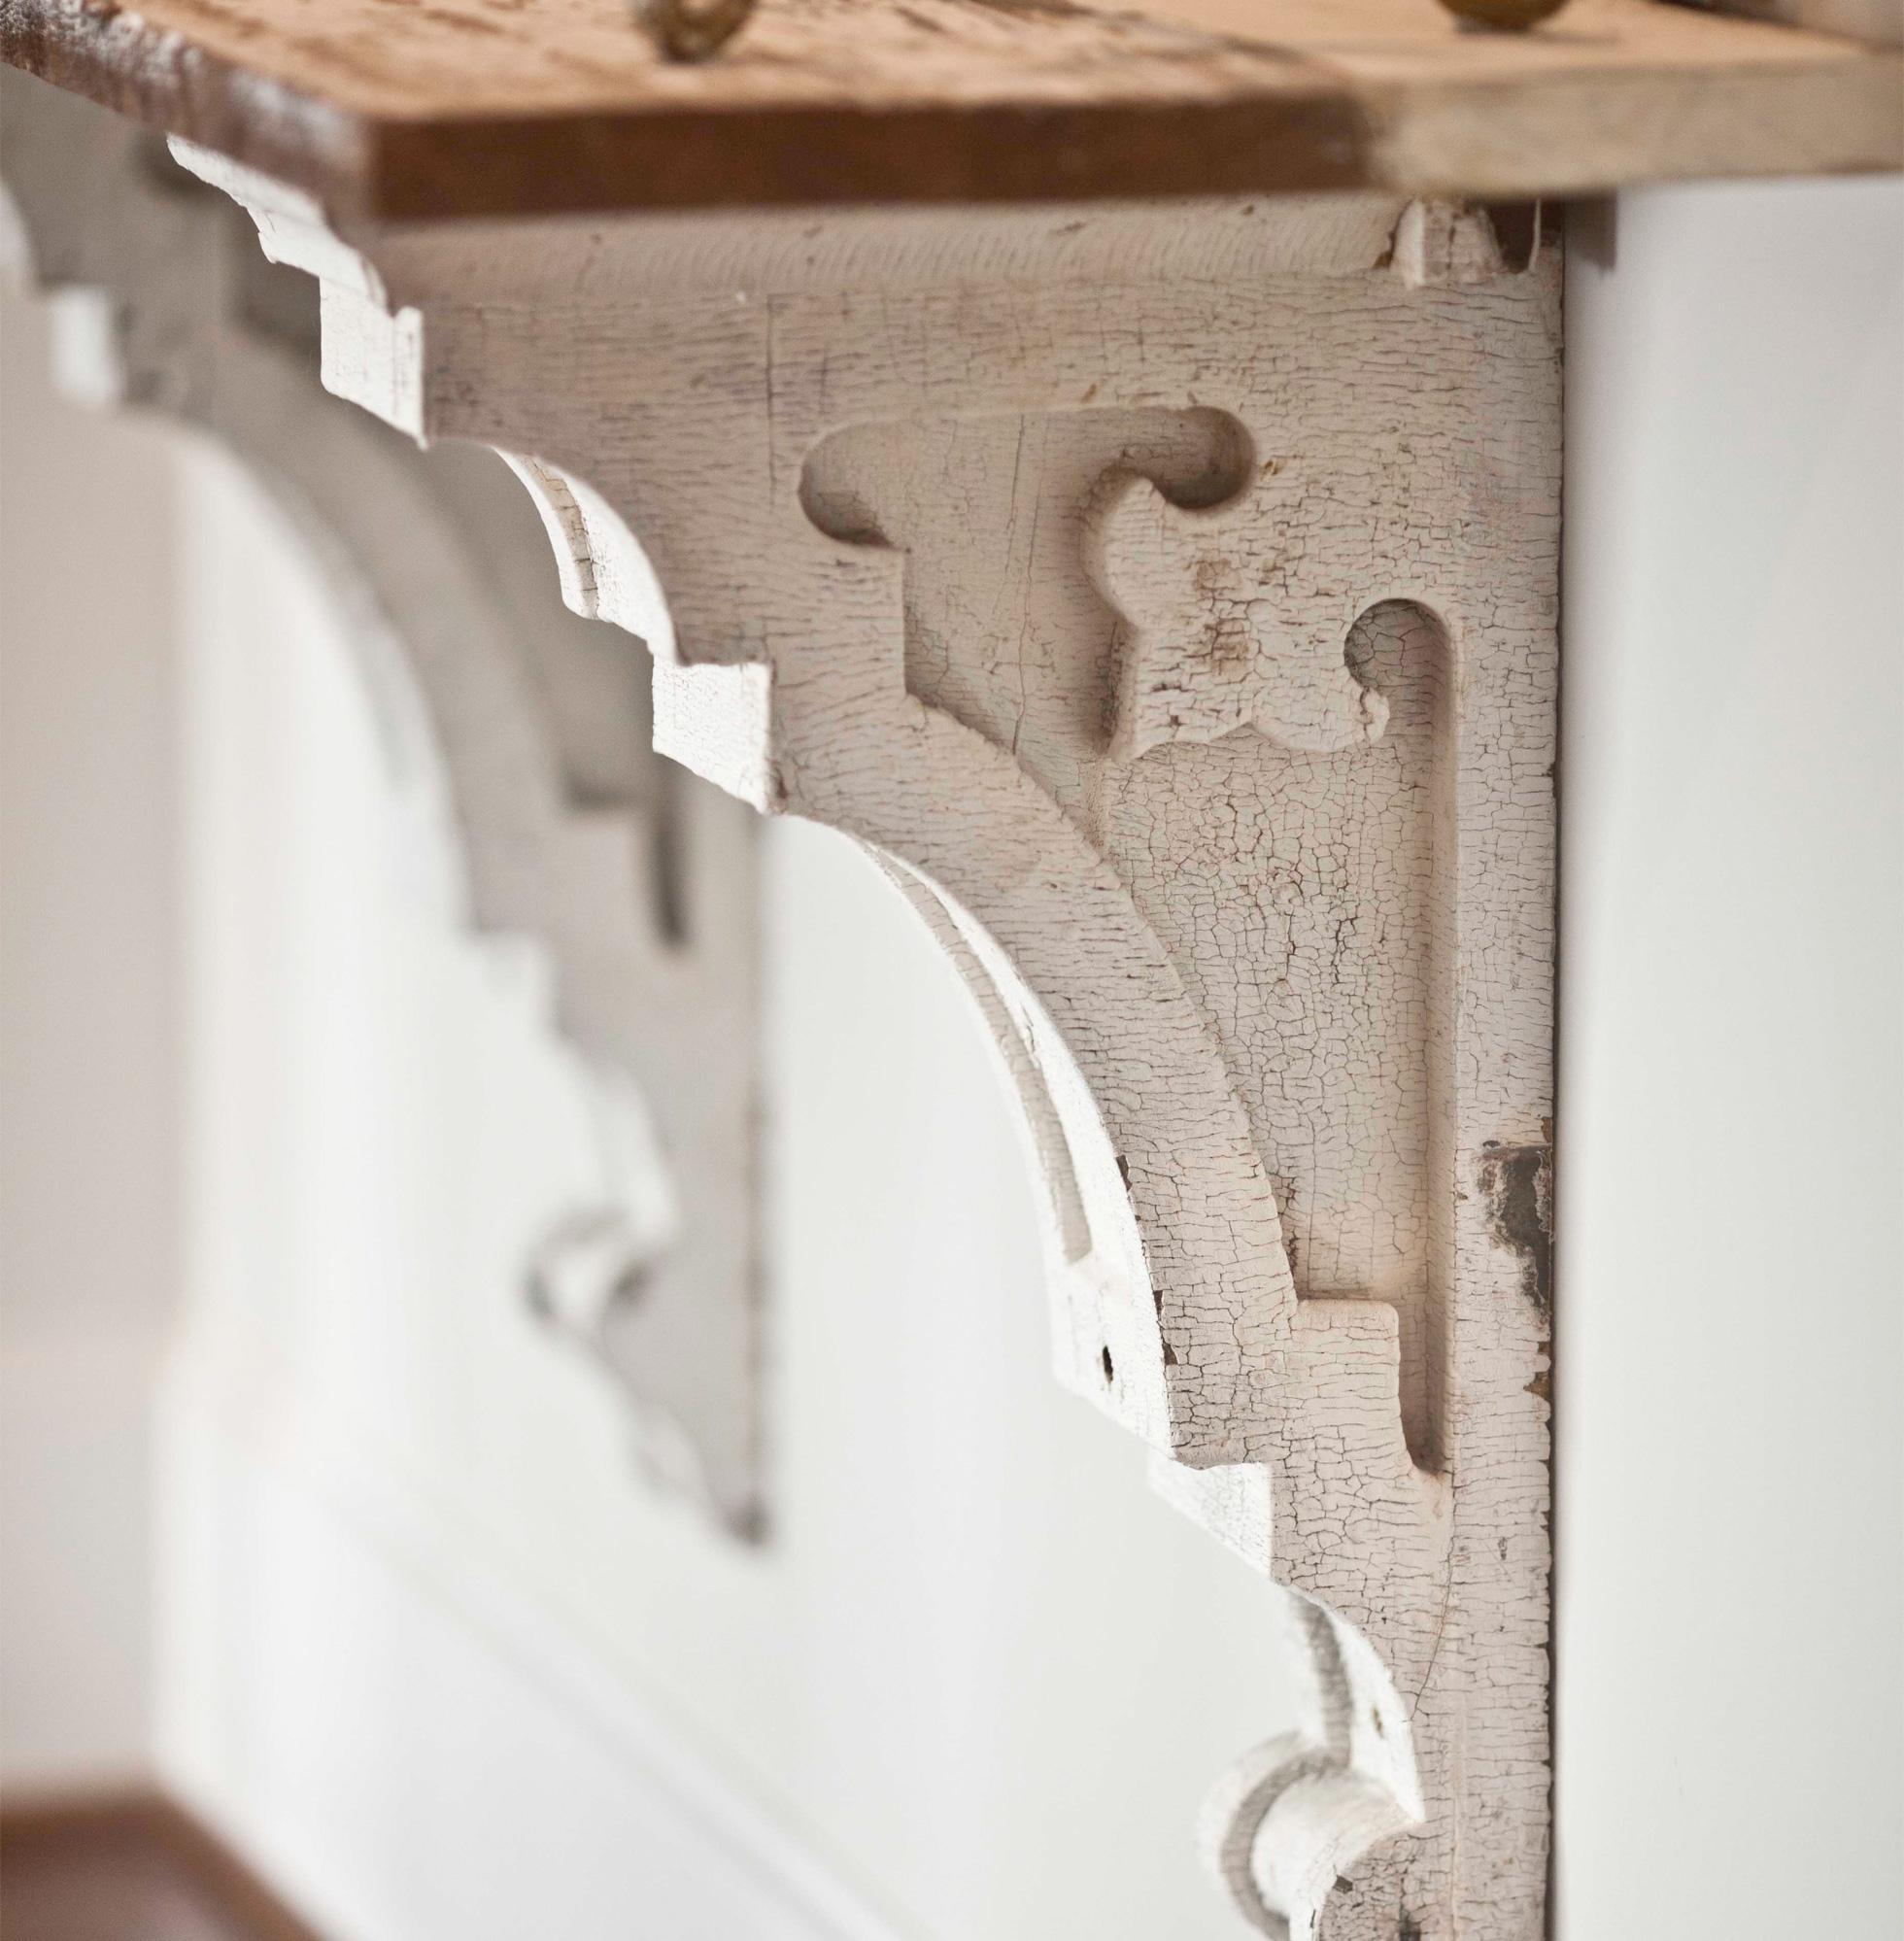 Vintage wood corbels in a home